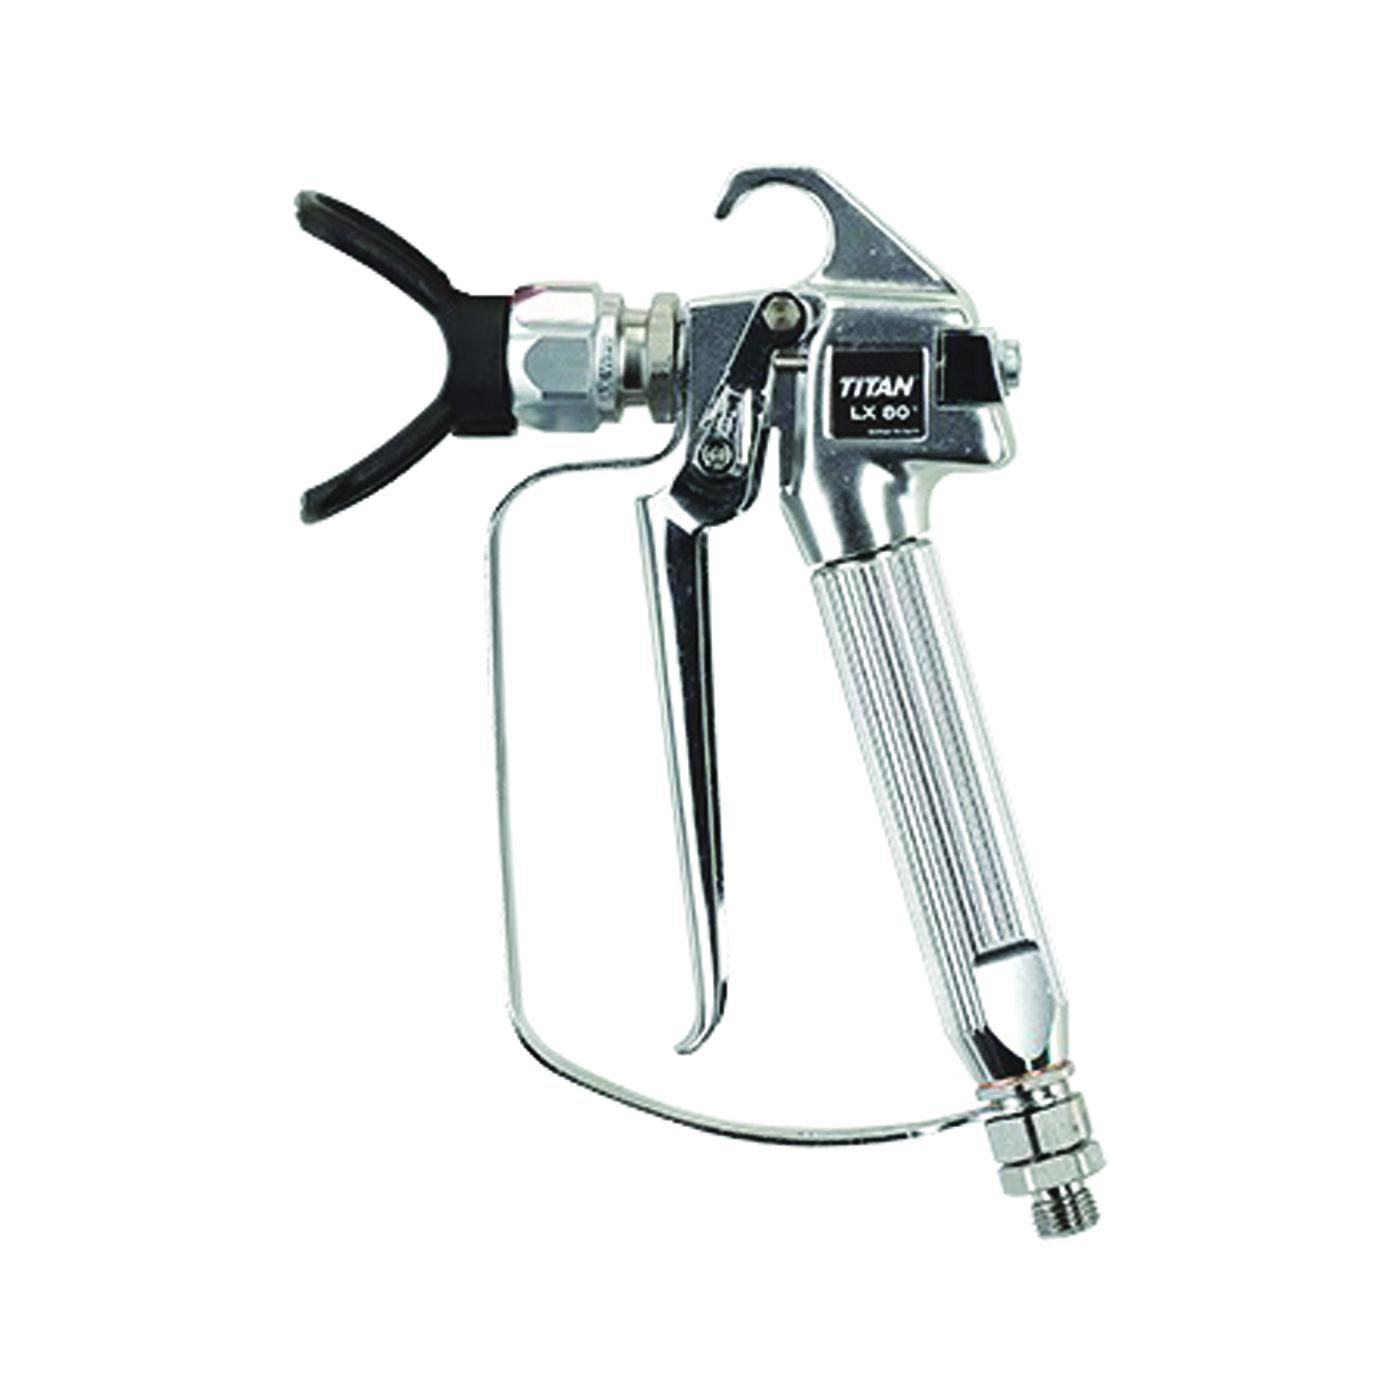 Picture of Wagner 0538007 Gun Control Kit, 3600 psi Pressure